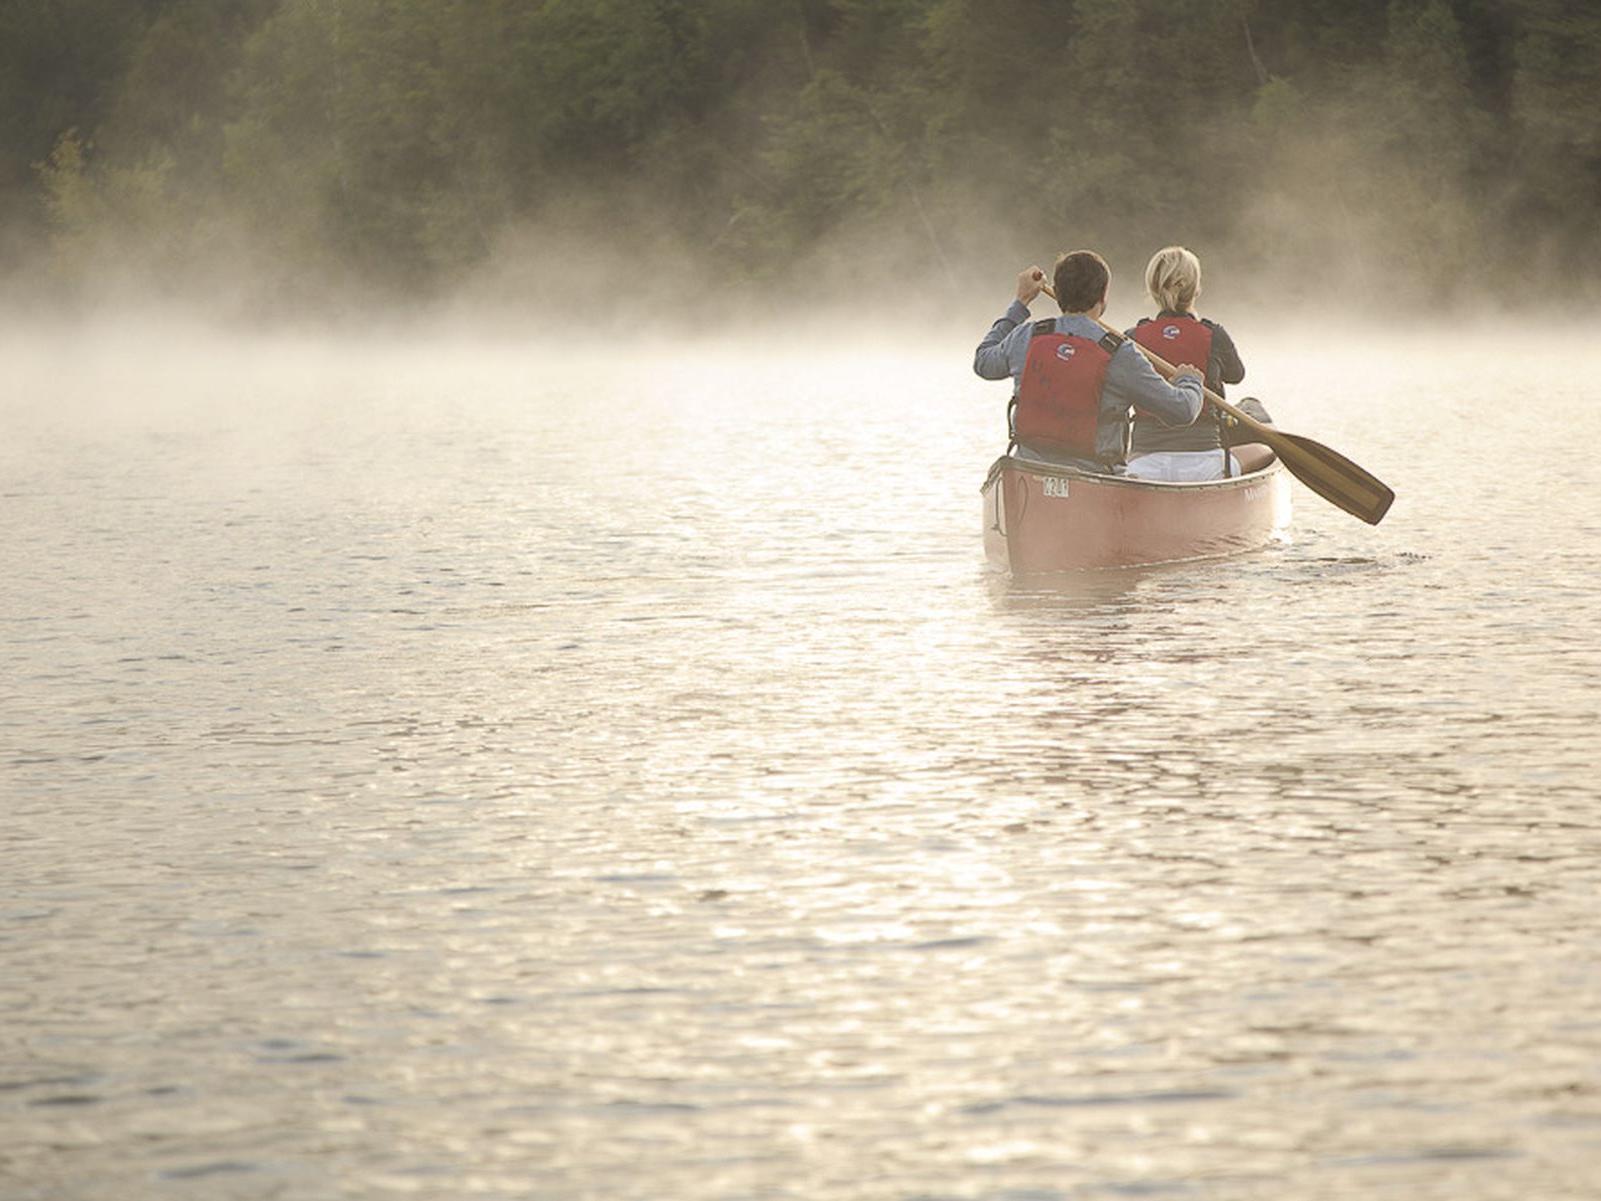 Couple canoeing on a misty lake.